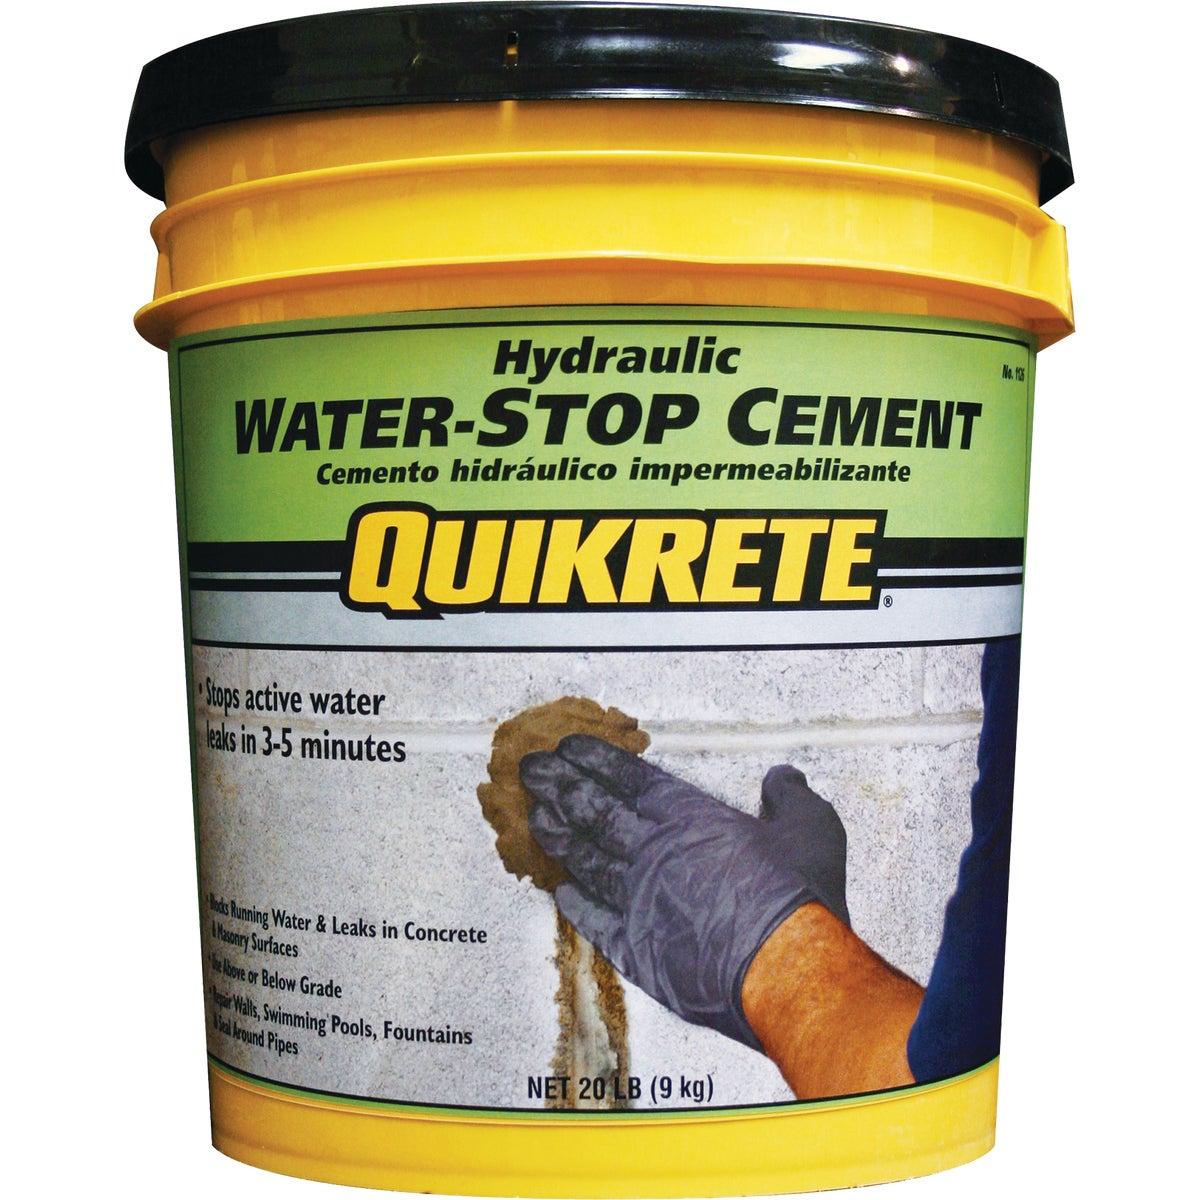 20Lb Hydrl Wtrstp Cement